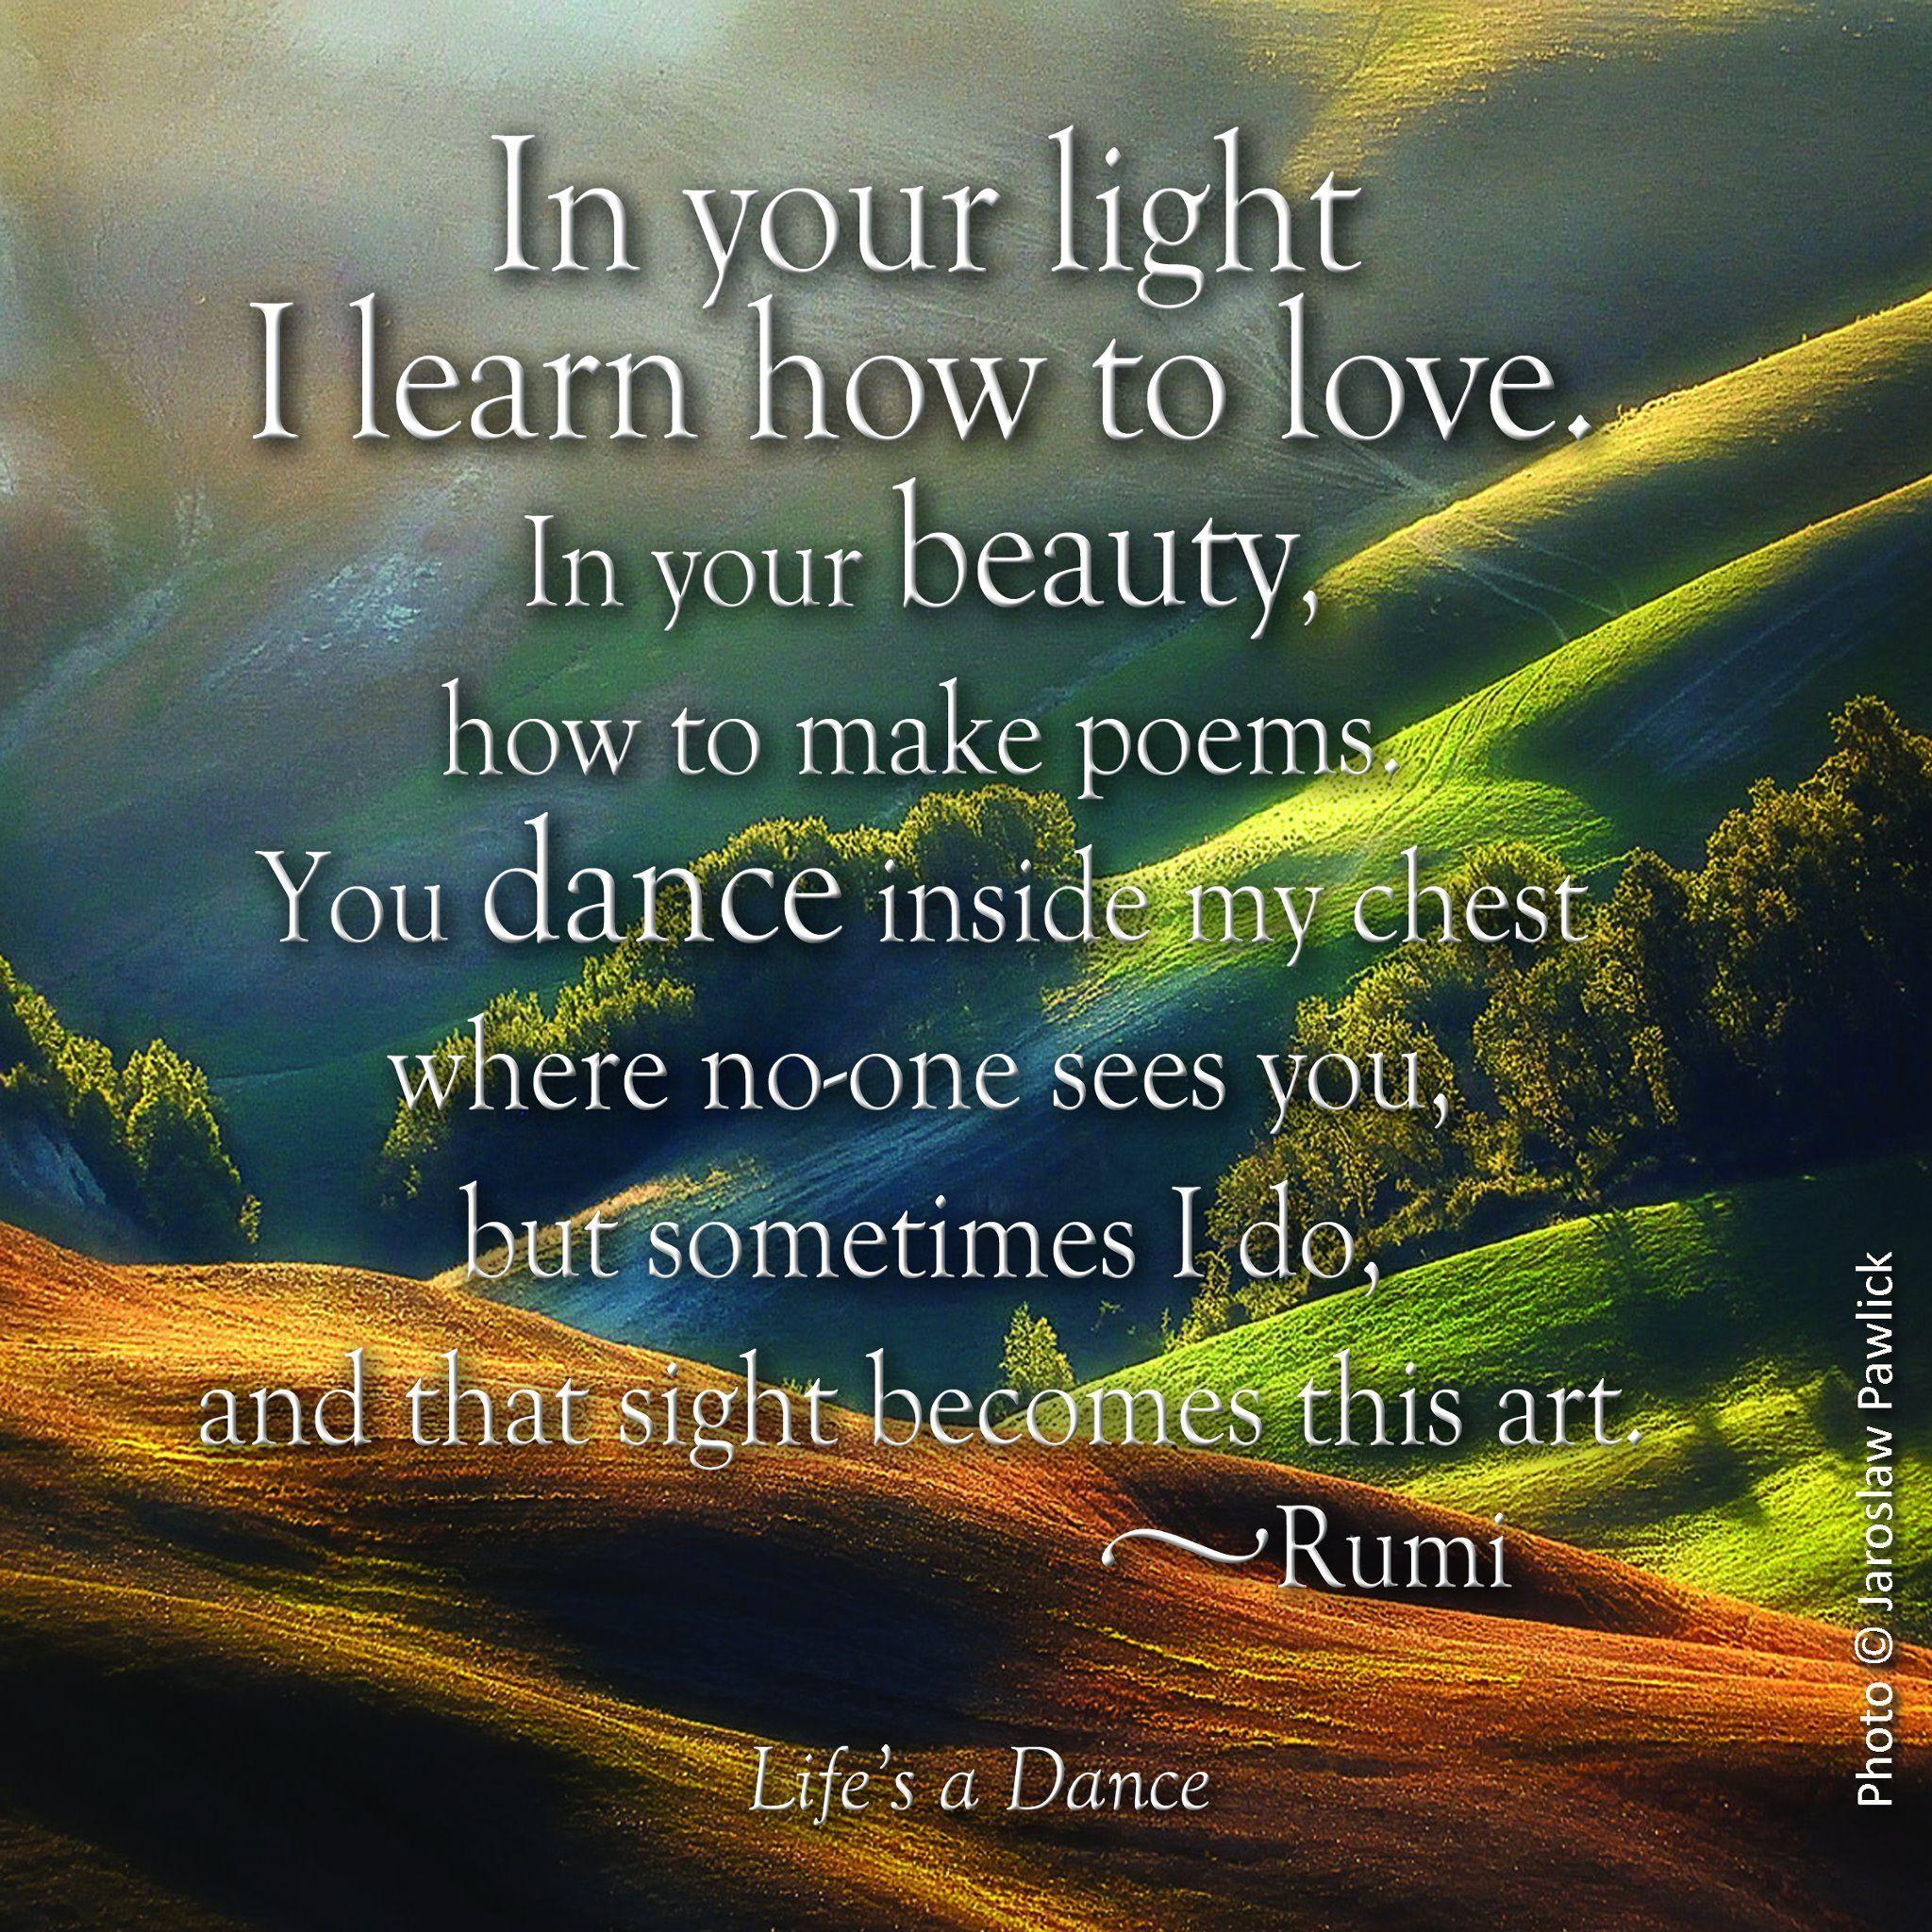 Rumi Dancing Through Raining Day Yet Feel The Rain Dropped Under